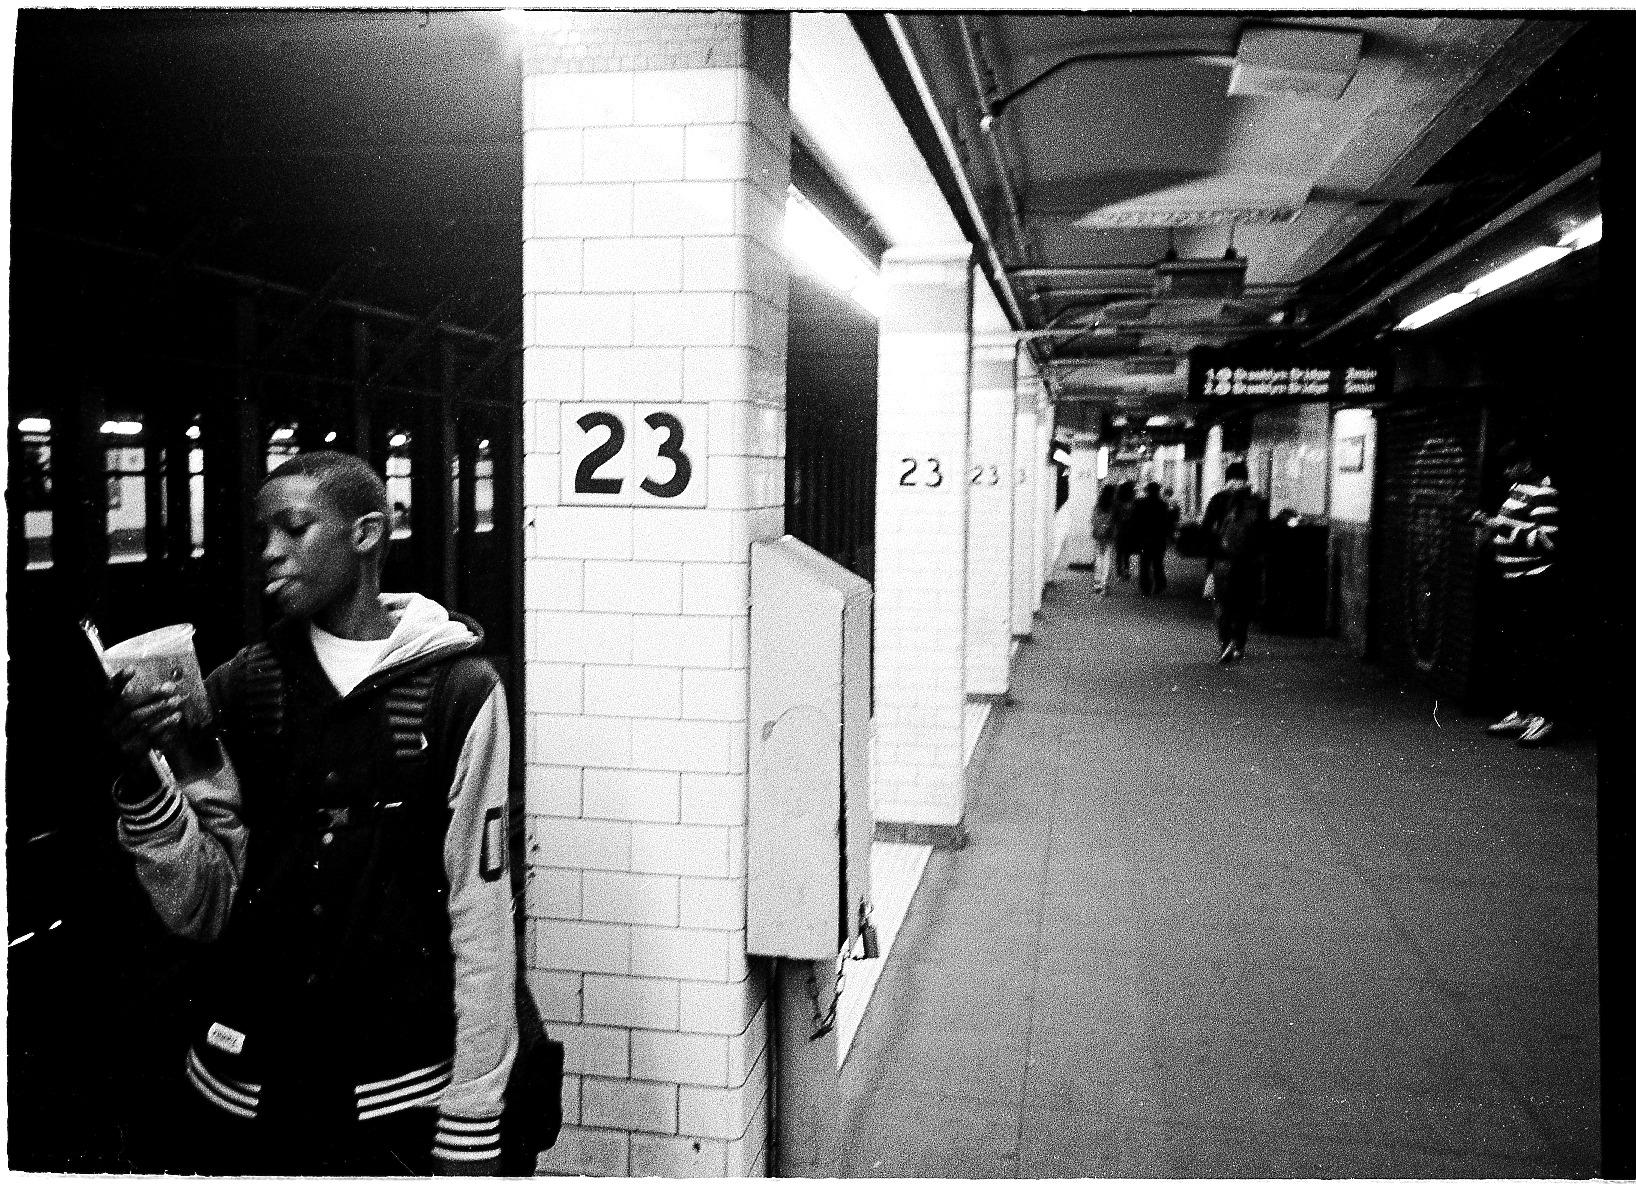 Seen on the 6 train platform